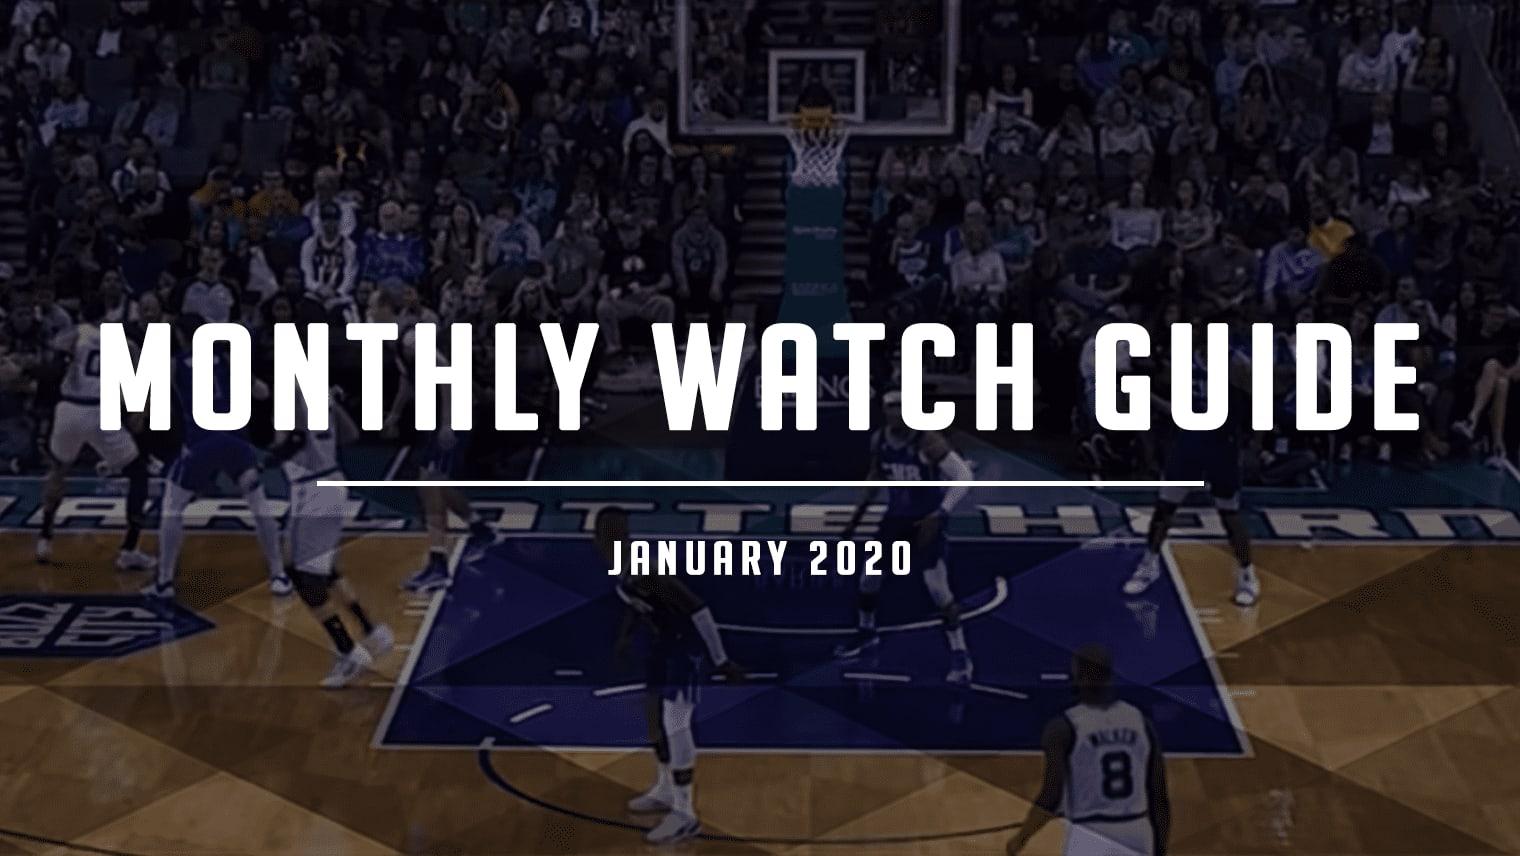 January 2020 Watch Guide